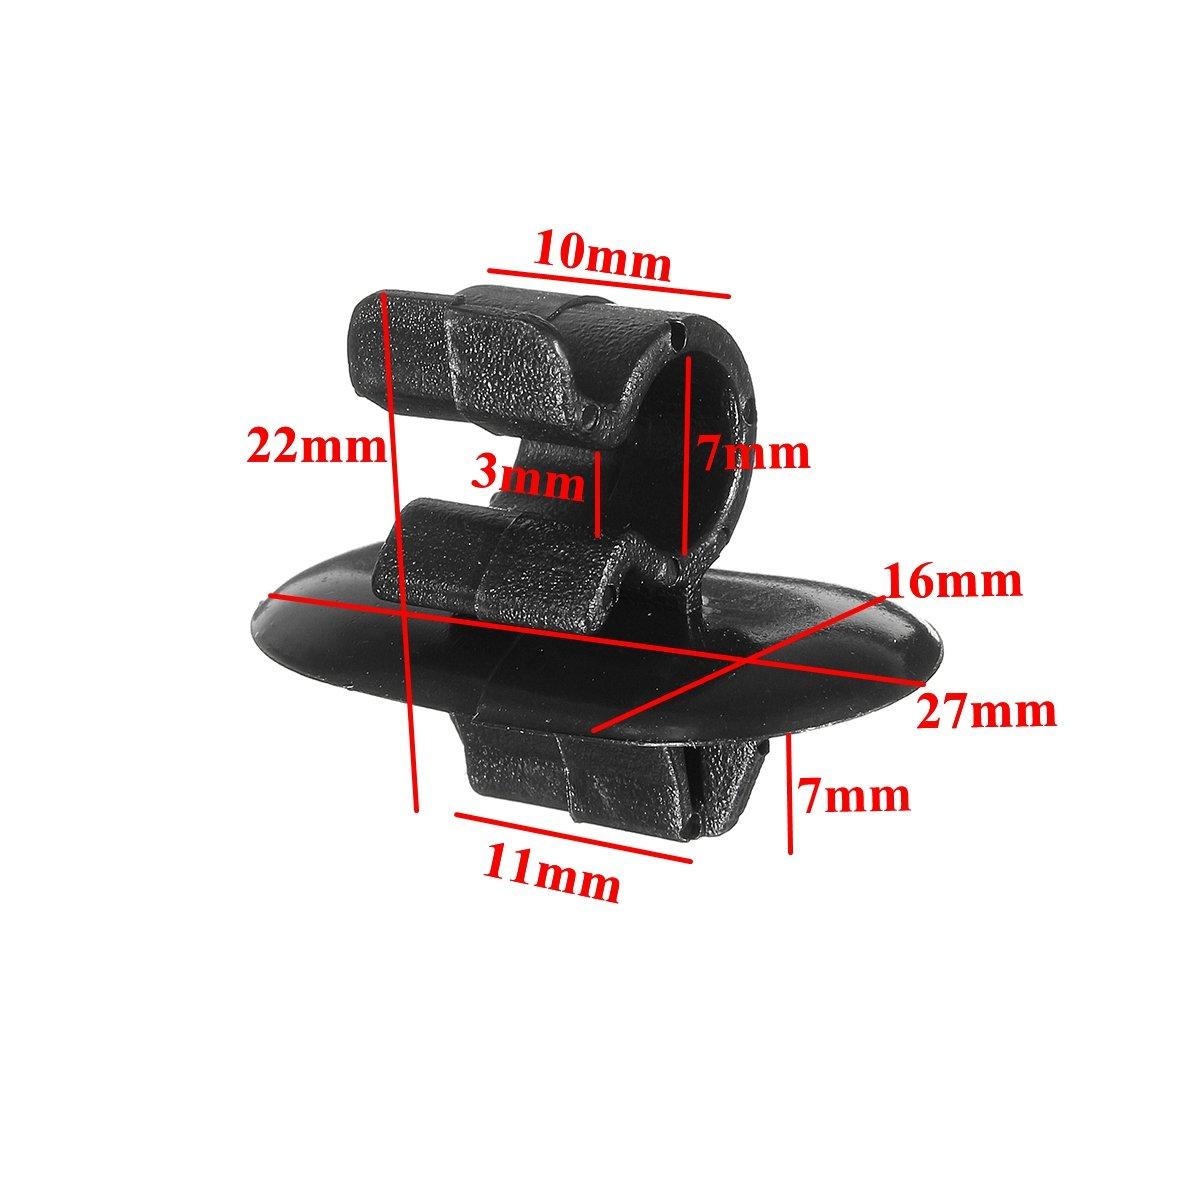 YONGYAO Zwei Pcs Motorhaubenhalter Clips aus Kunststoff f/ür Citroen f/ür Peugeot Vauxhall Vivaro